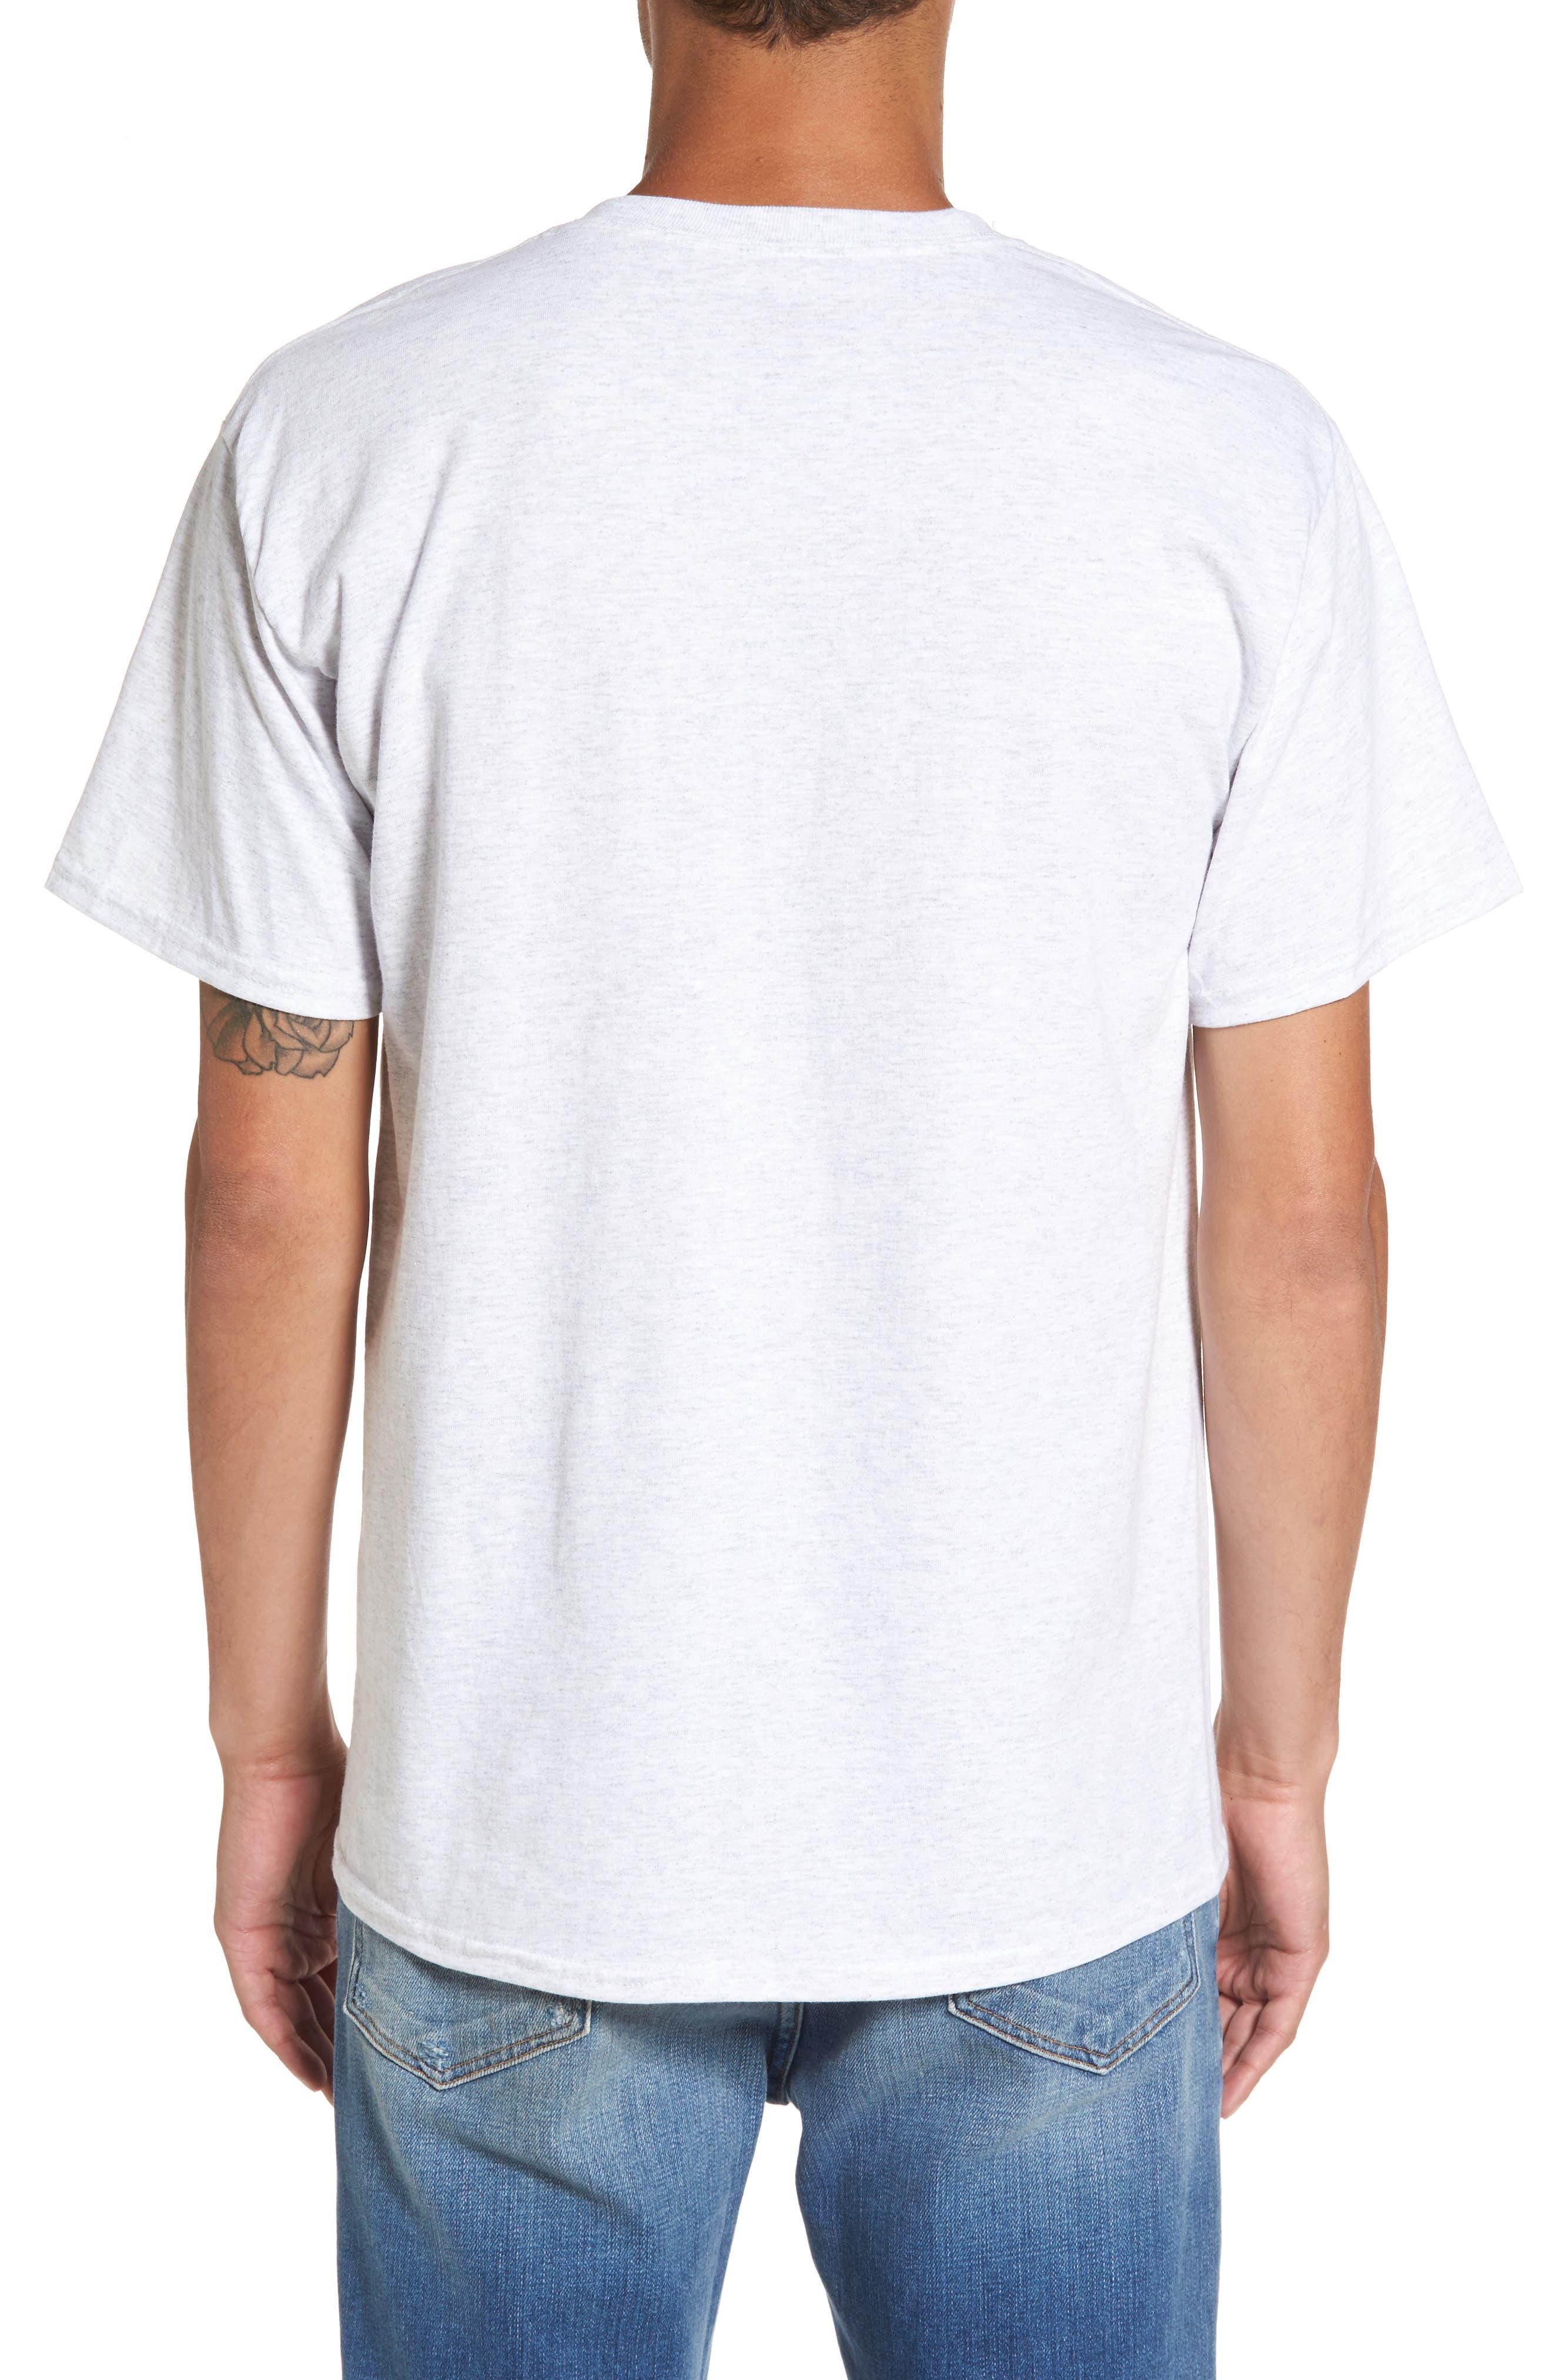 NIKBEN Egg T-Shirt,                             Alternate thumbnail 3, color,                             020